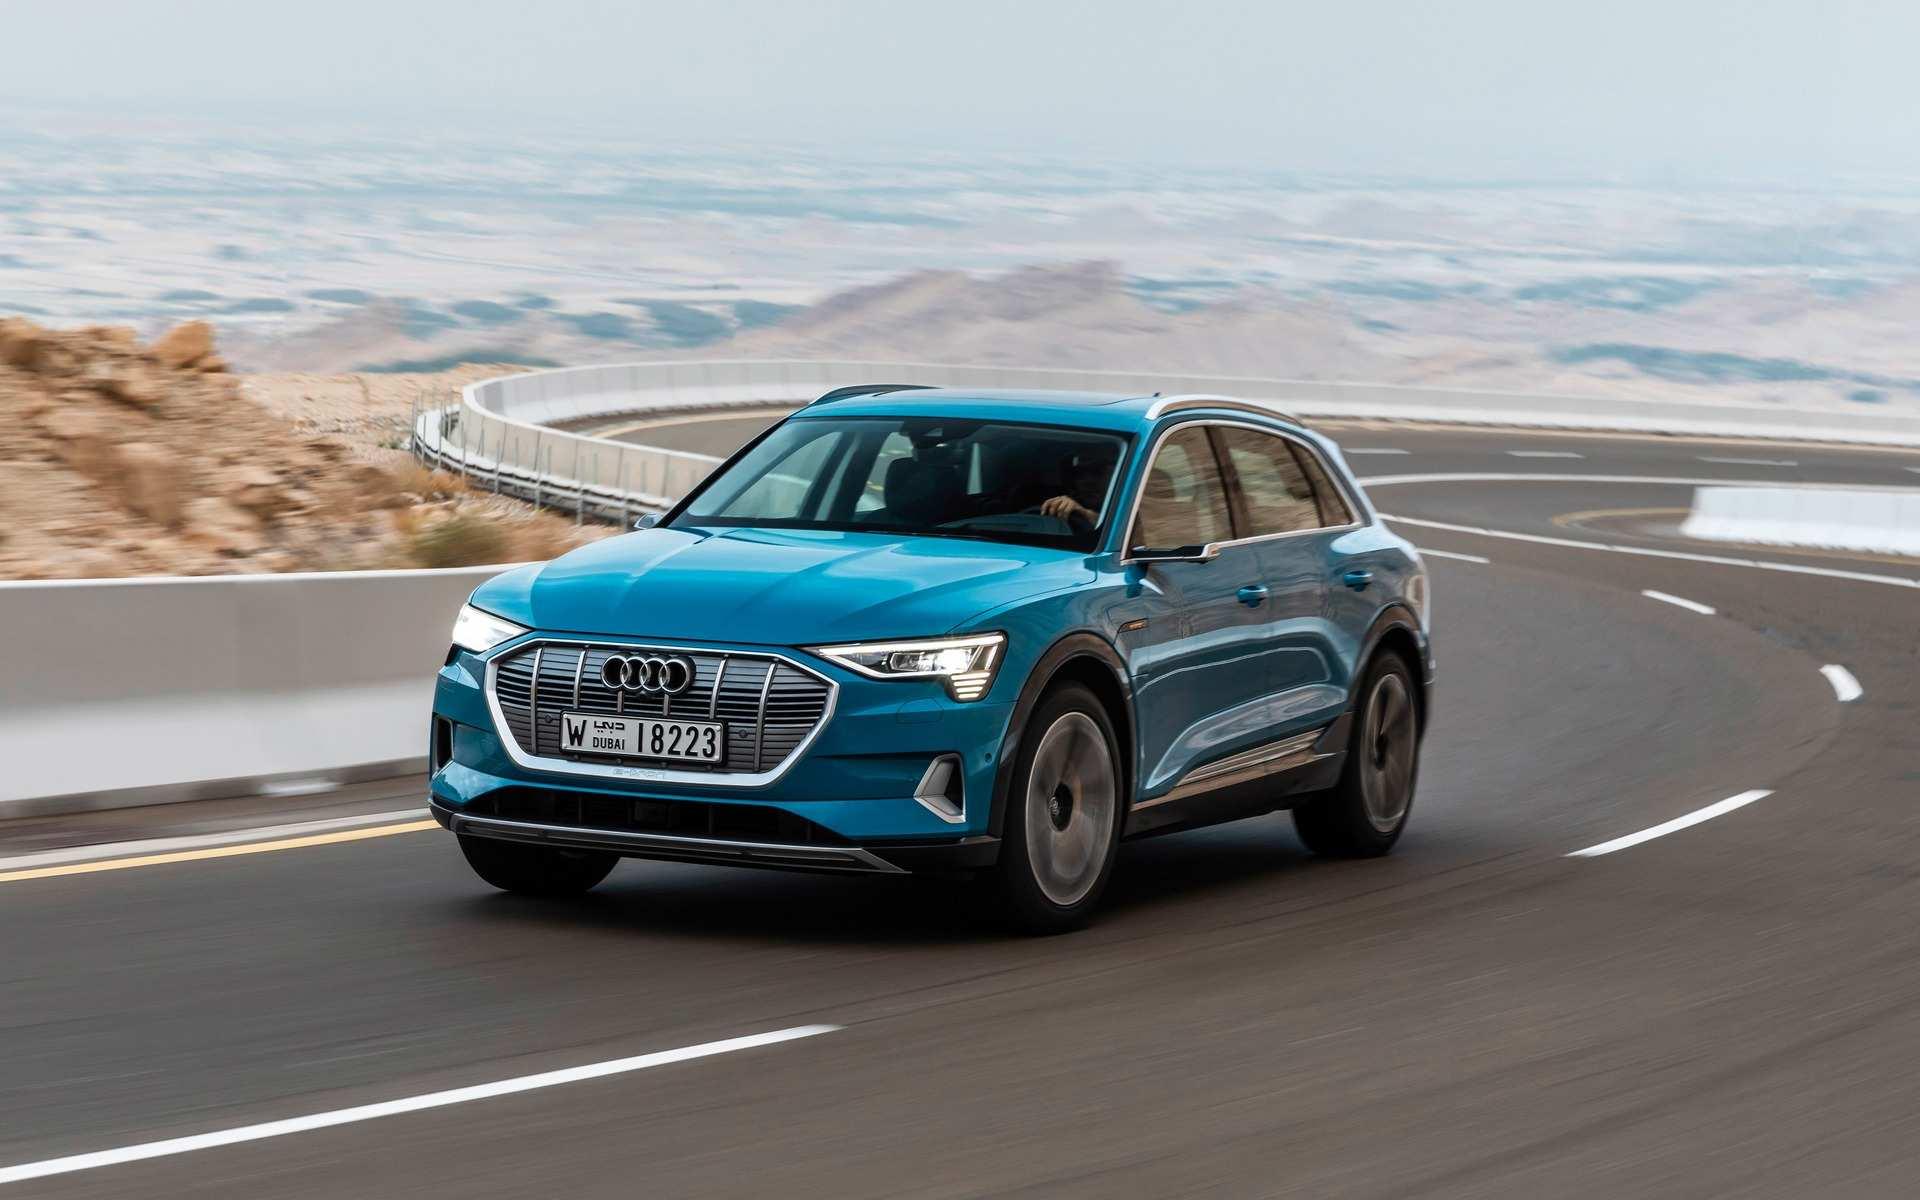 88 Best Review 2019 Audi E Tron Quattro Release Date Concept by 2019 Audi E Tron Quattro Release Date